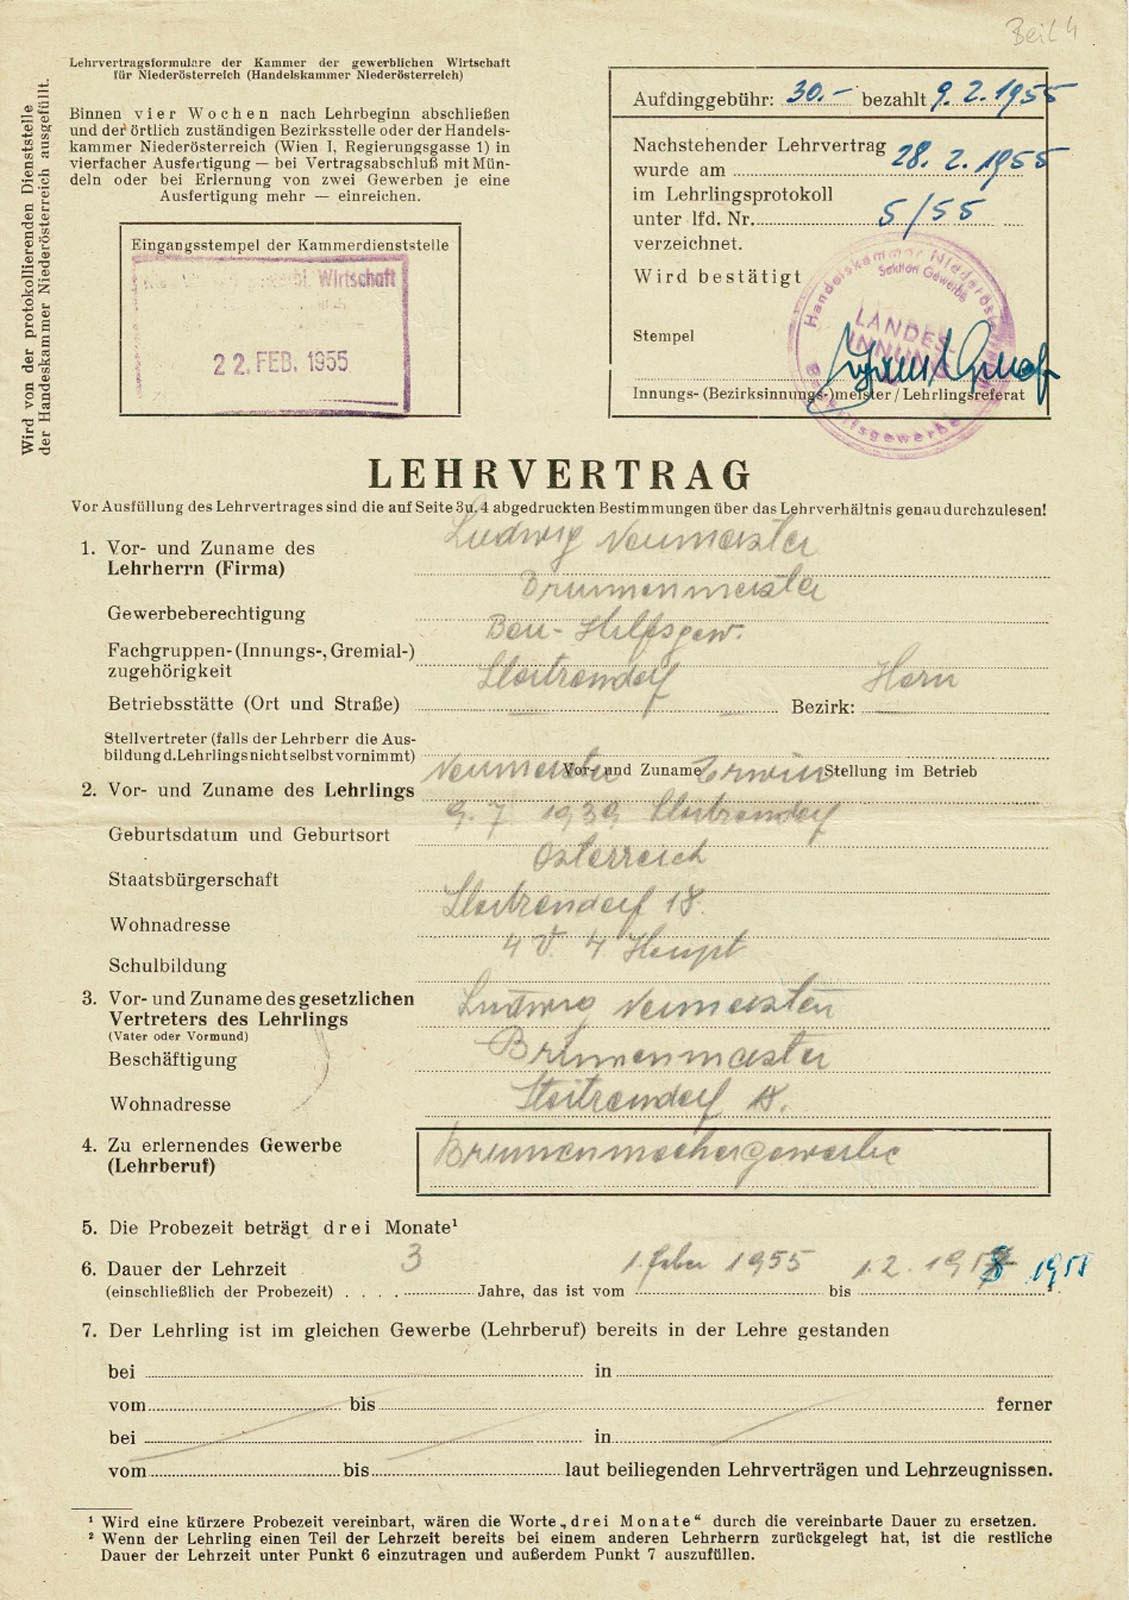 Lehrvertrag Erwin Neumeister – 3. Generation